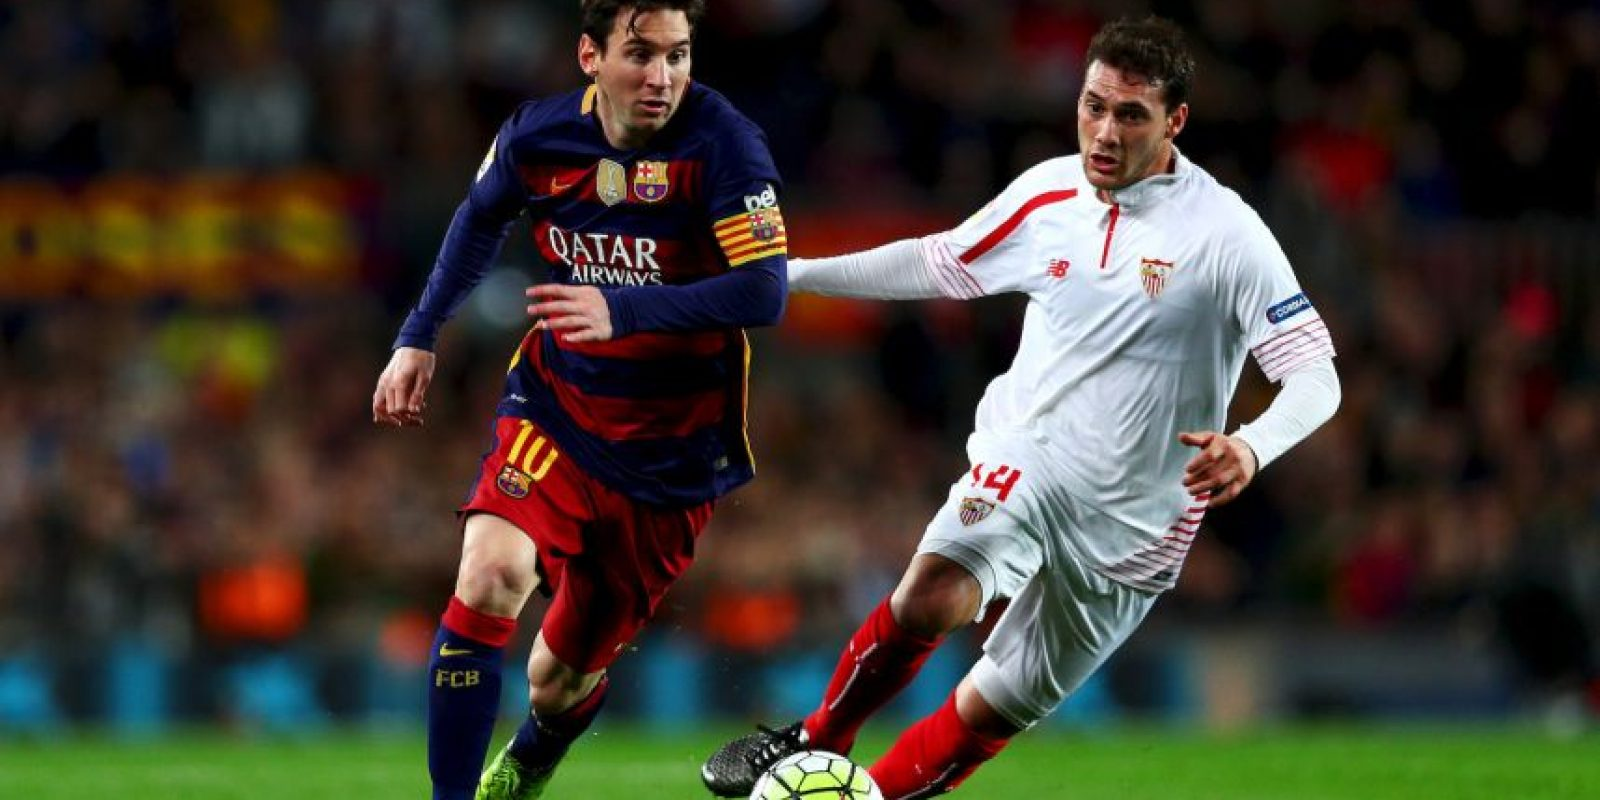 Barcelona vs. Sevilla se miden en la final de la Copa del Rey Foto:Getty Images